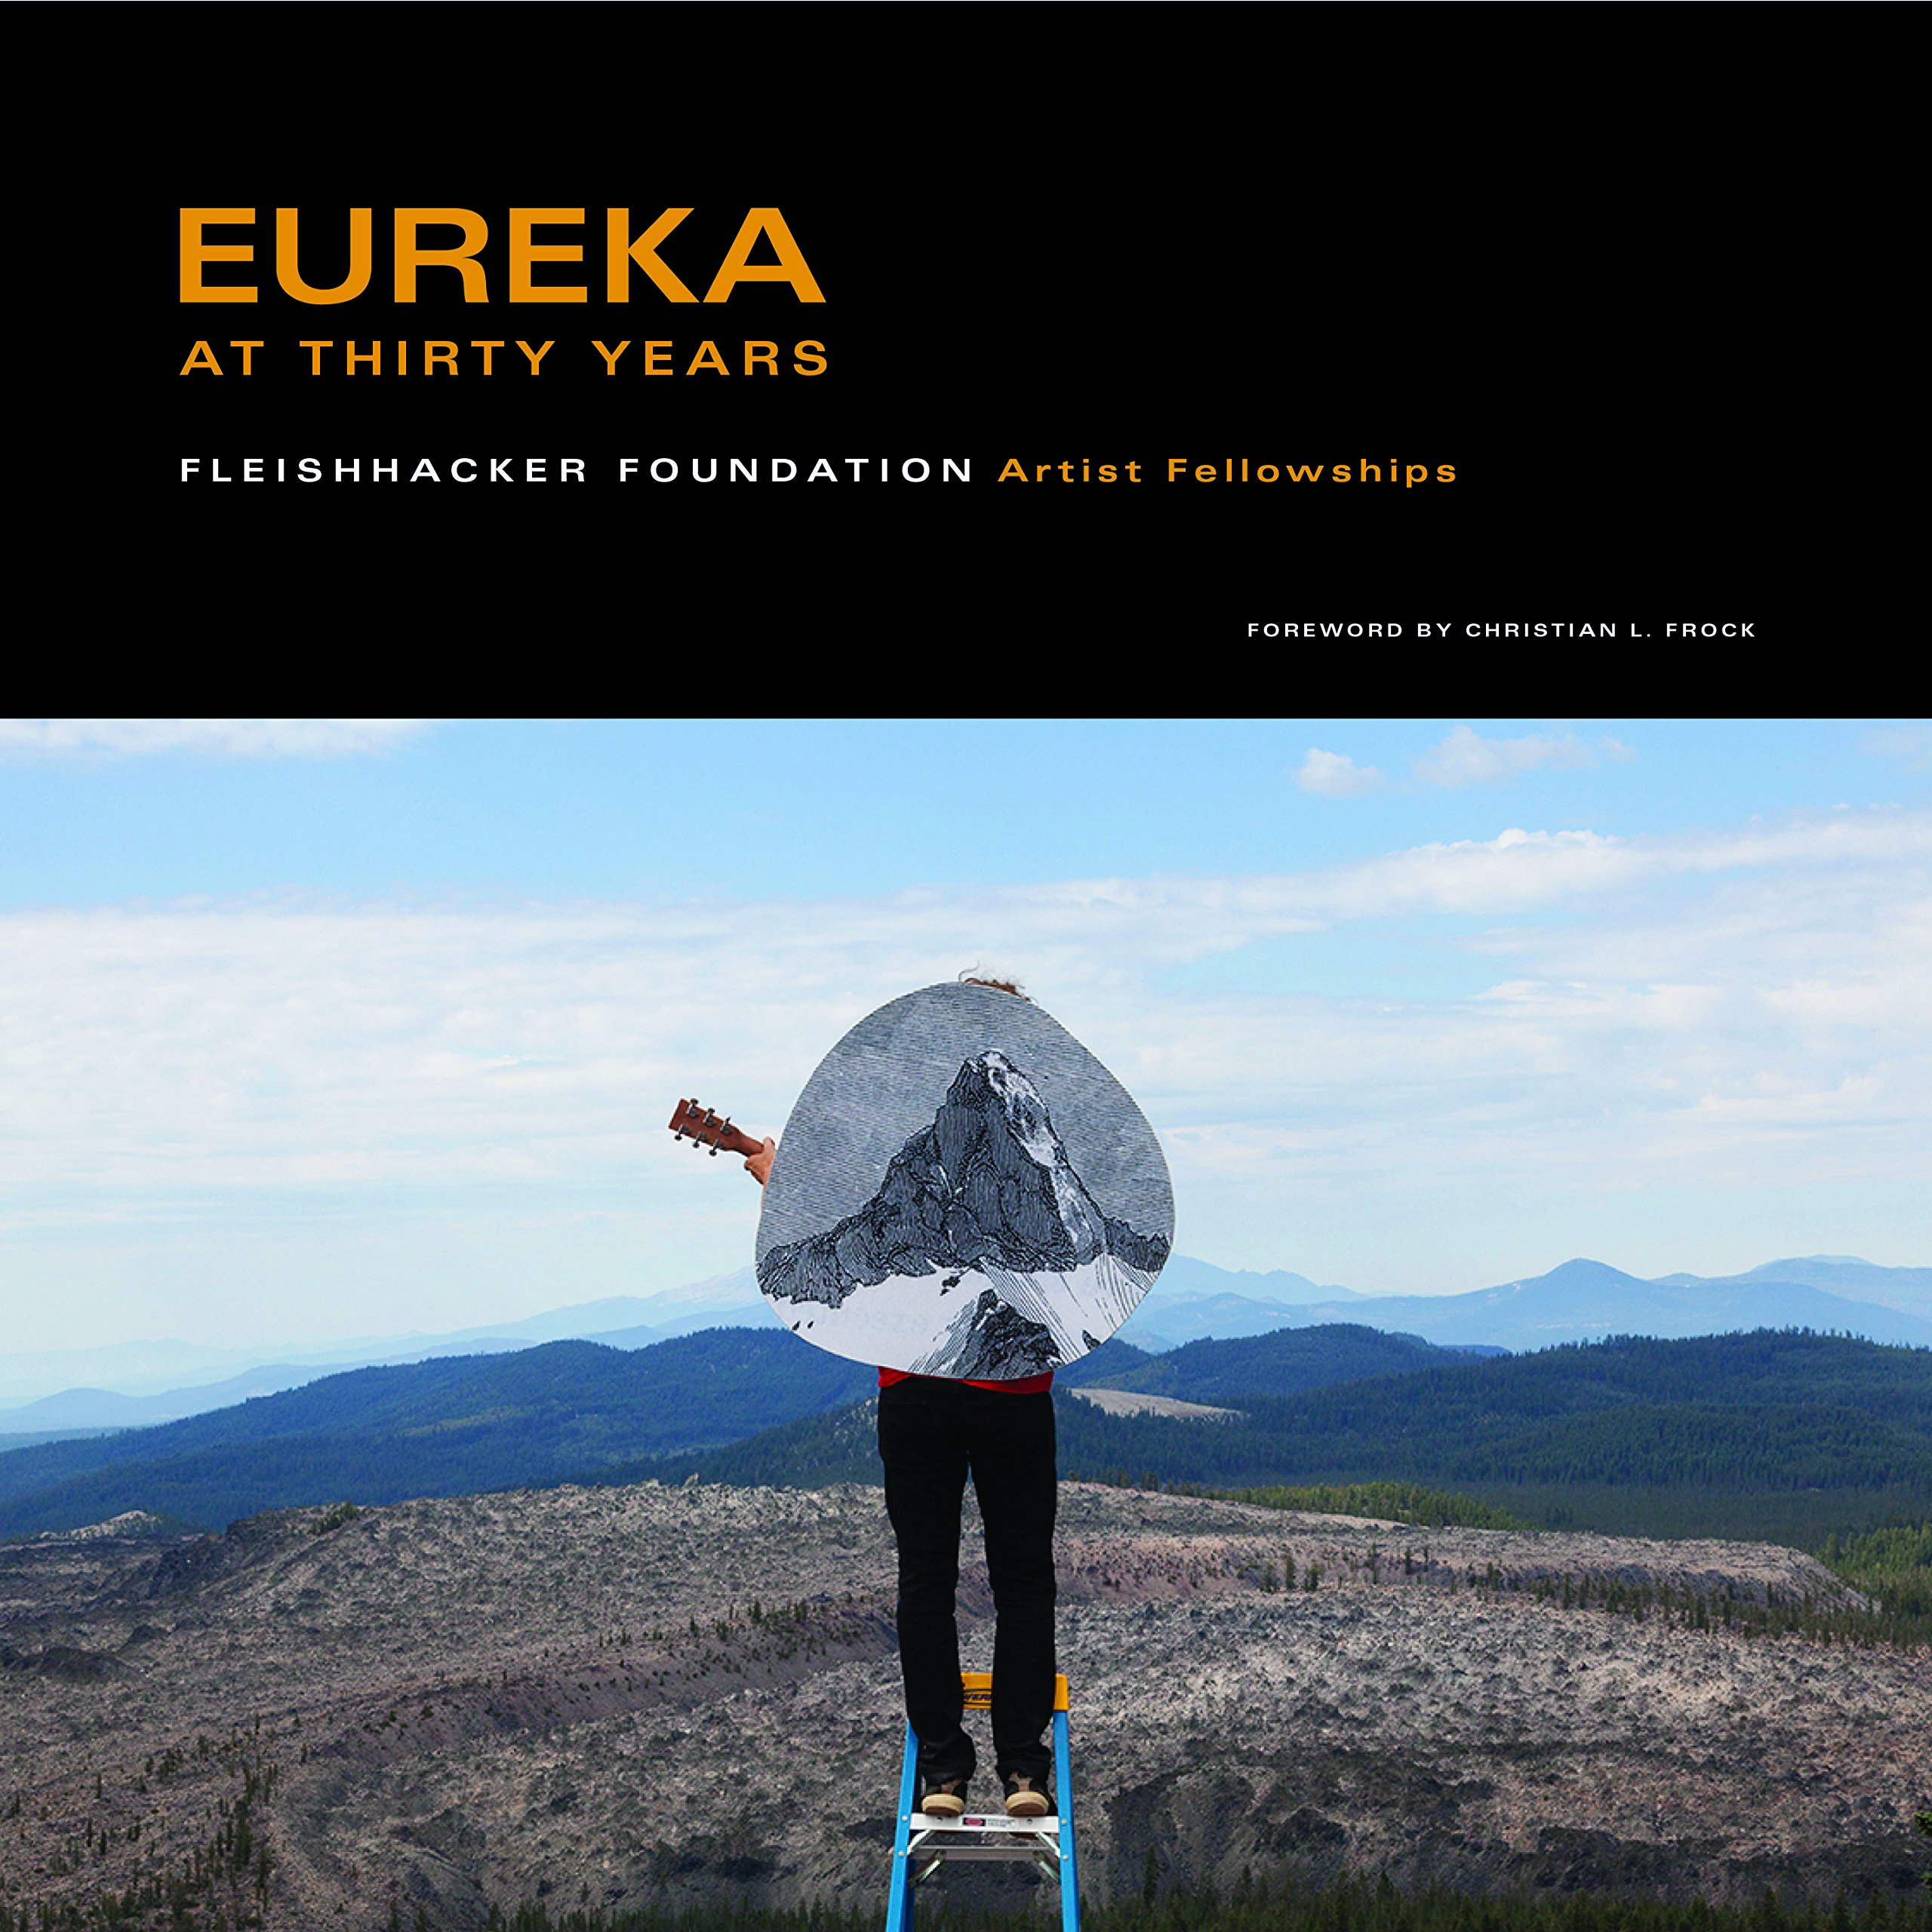 Download Eureka at Thirty Years - The Fleishhacker Foundation Artist Fellowships ebook